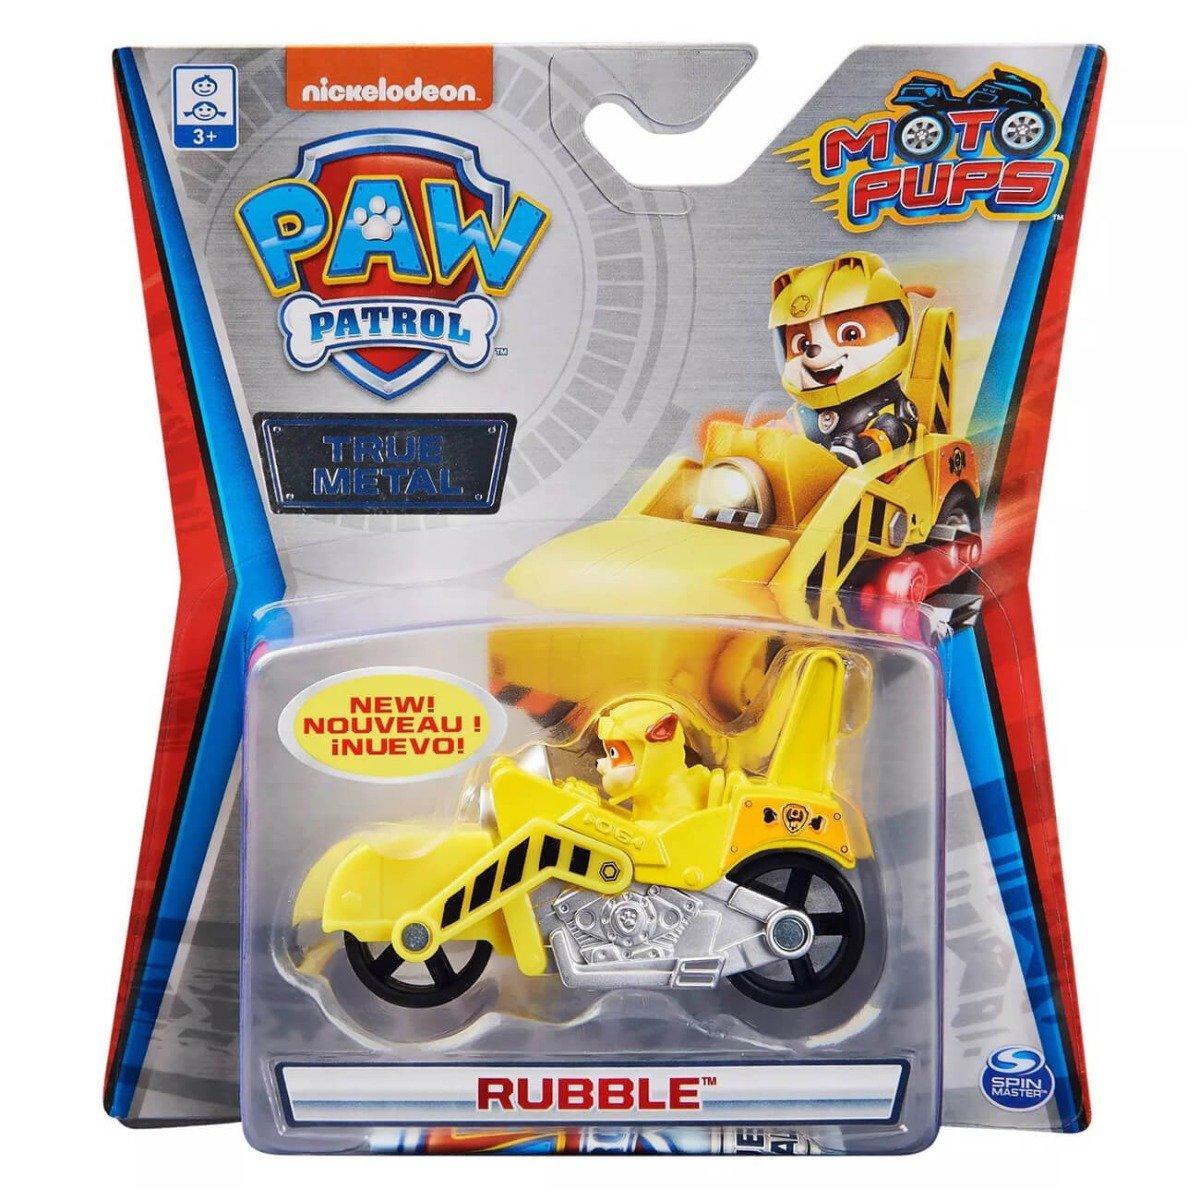 Masinuta cu figurina Paw Patrol True Metal, Rubble, 20130496